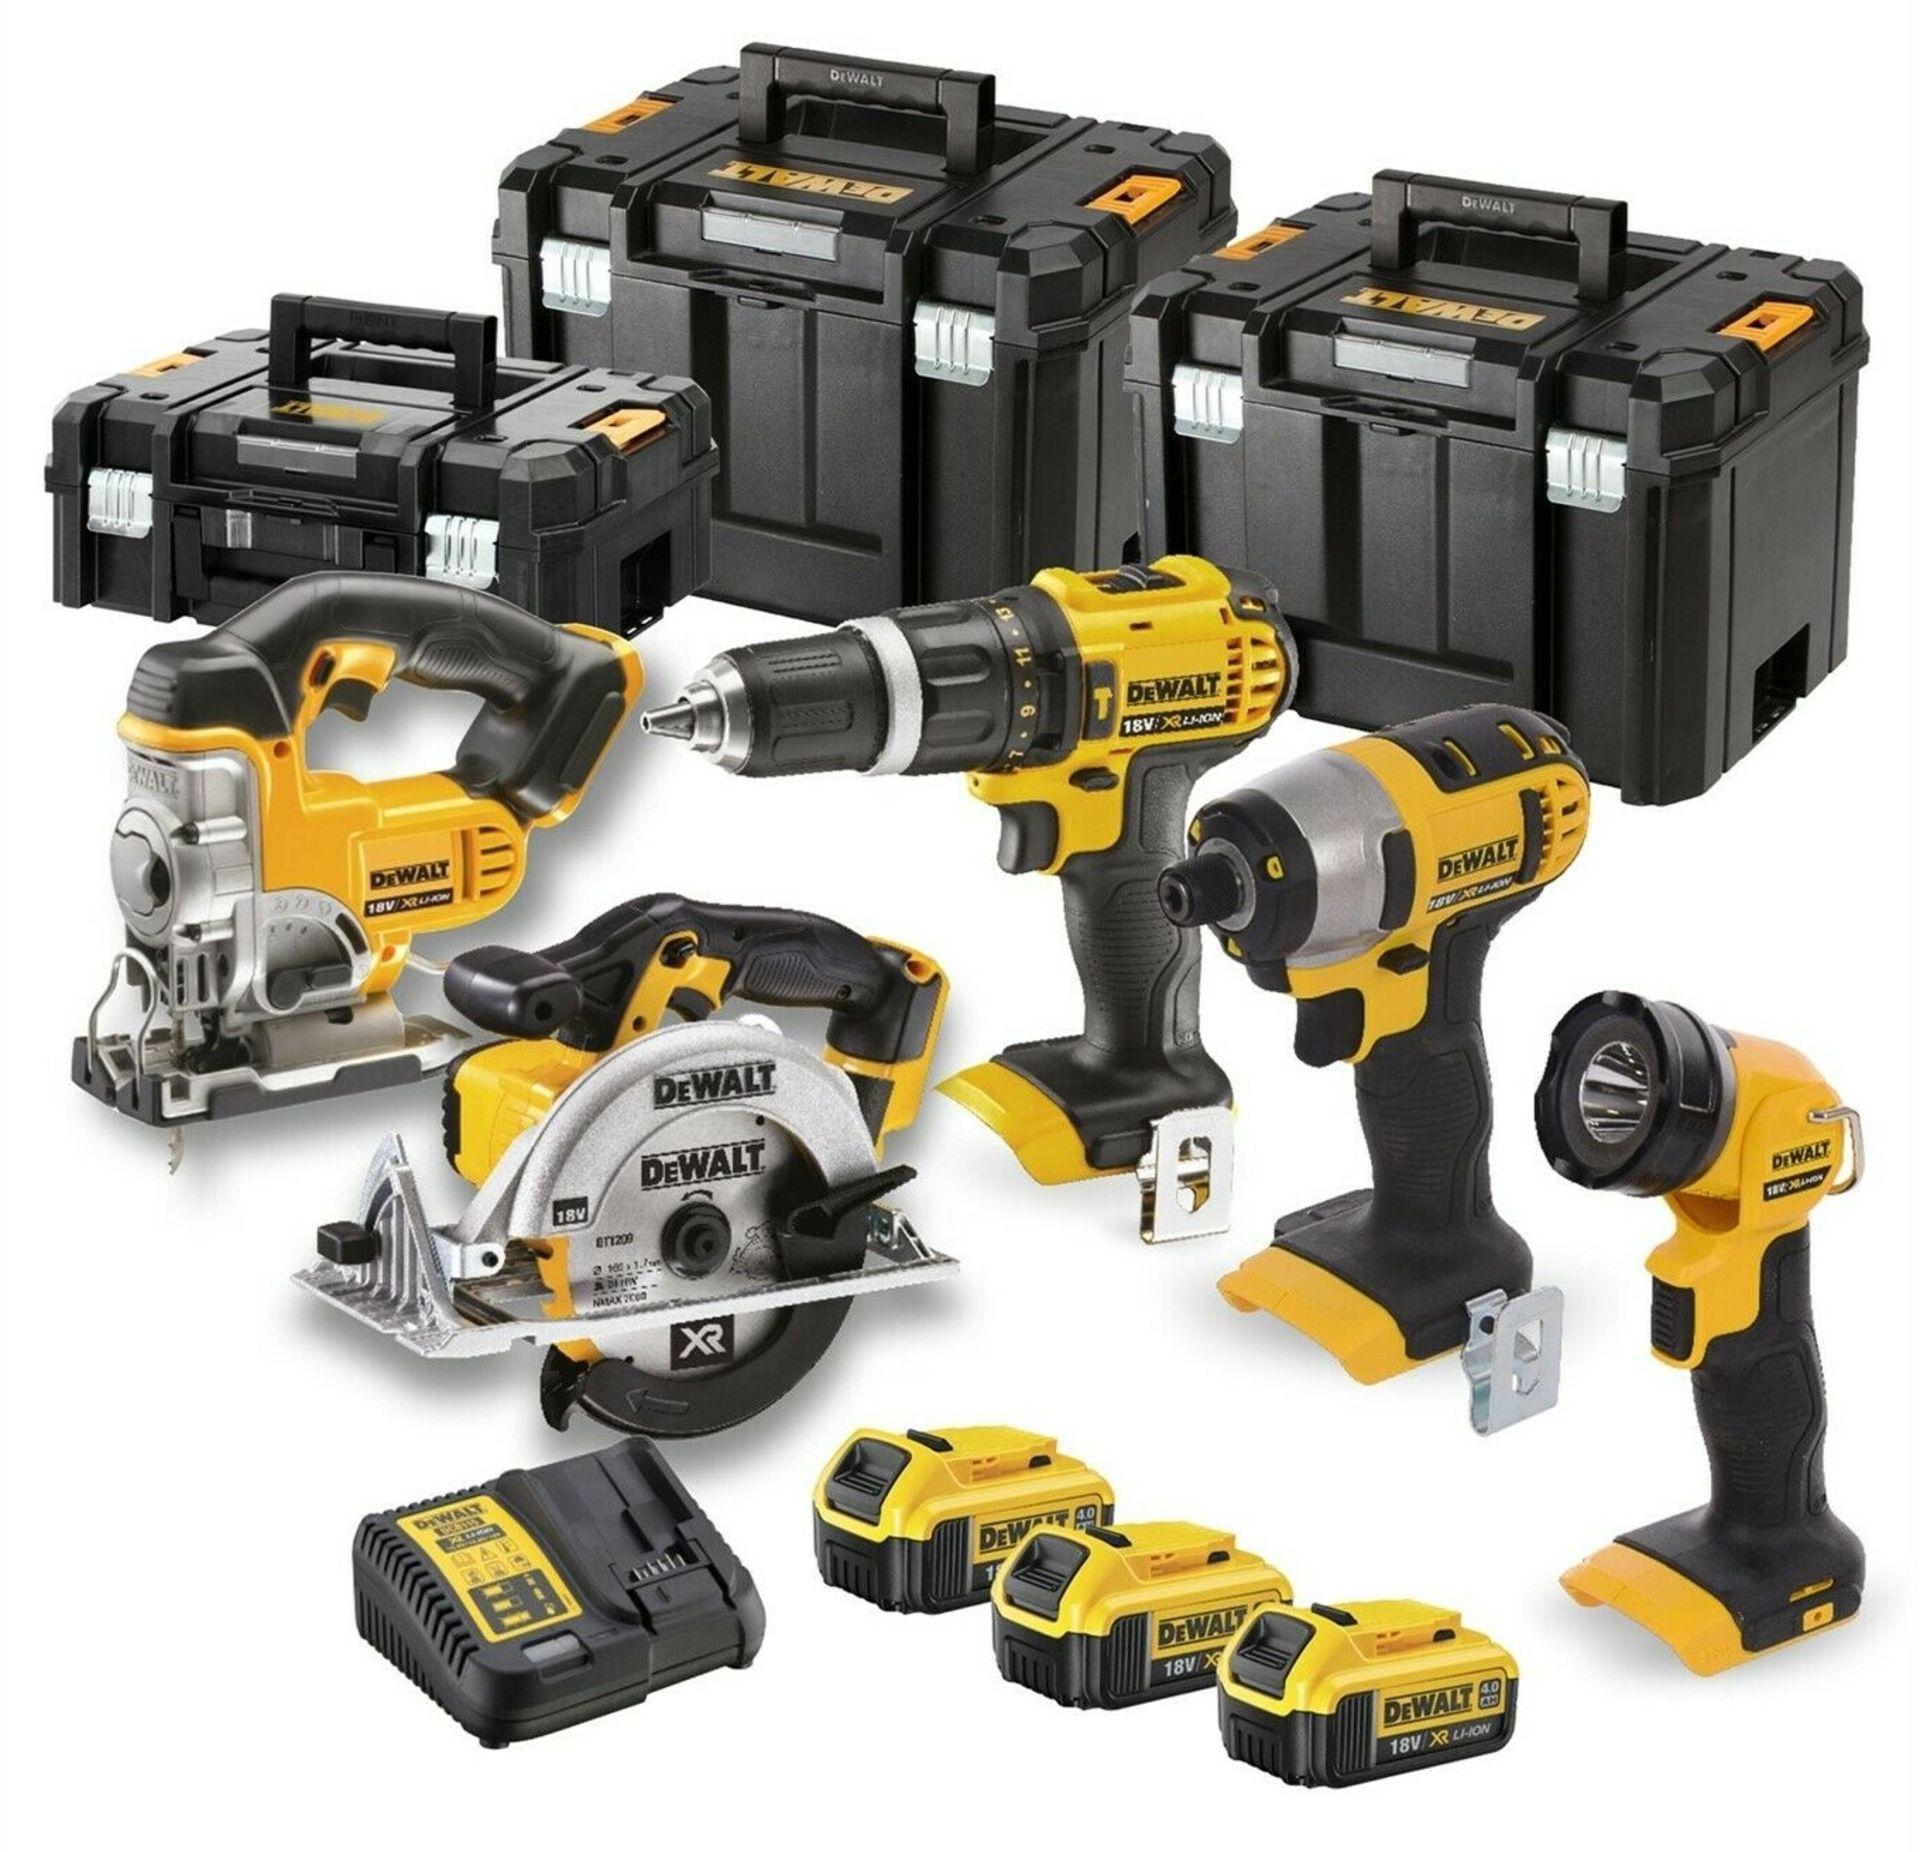 Lot 17011 - V Brand New DeWalt 18v 5 Piece Set Inc 3x 5.0Ah Batteries - Kit Includes Impact Driver + Combi Drill